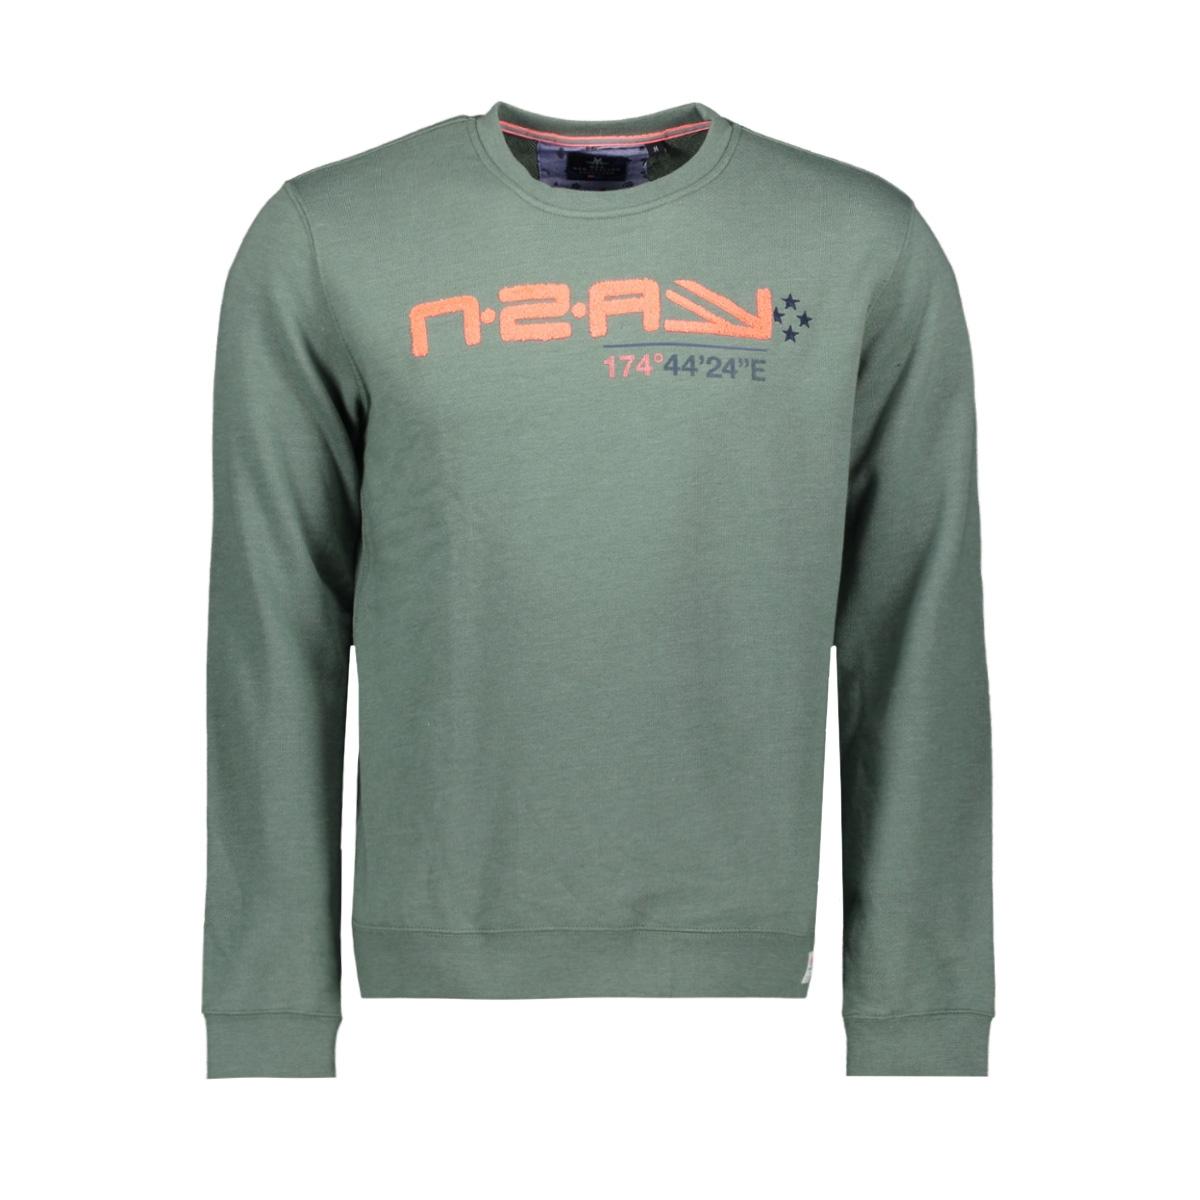 waiotama 19an300 nza sweater 486 spring army